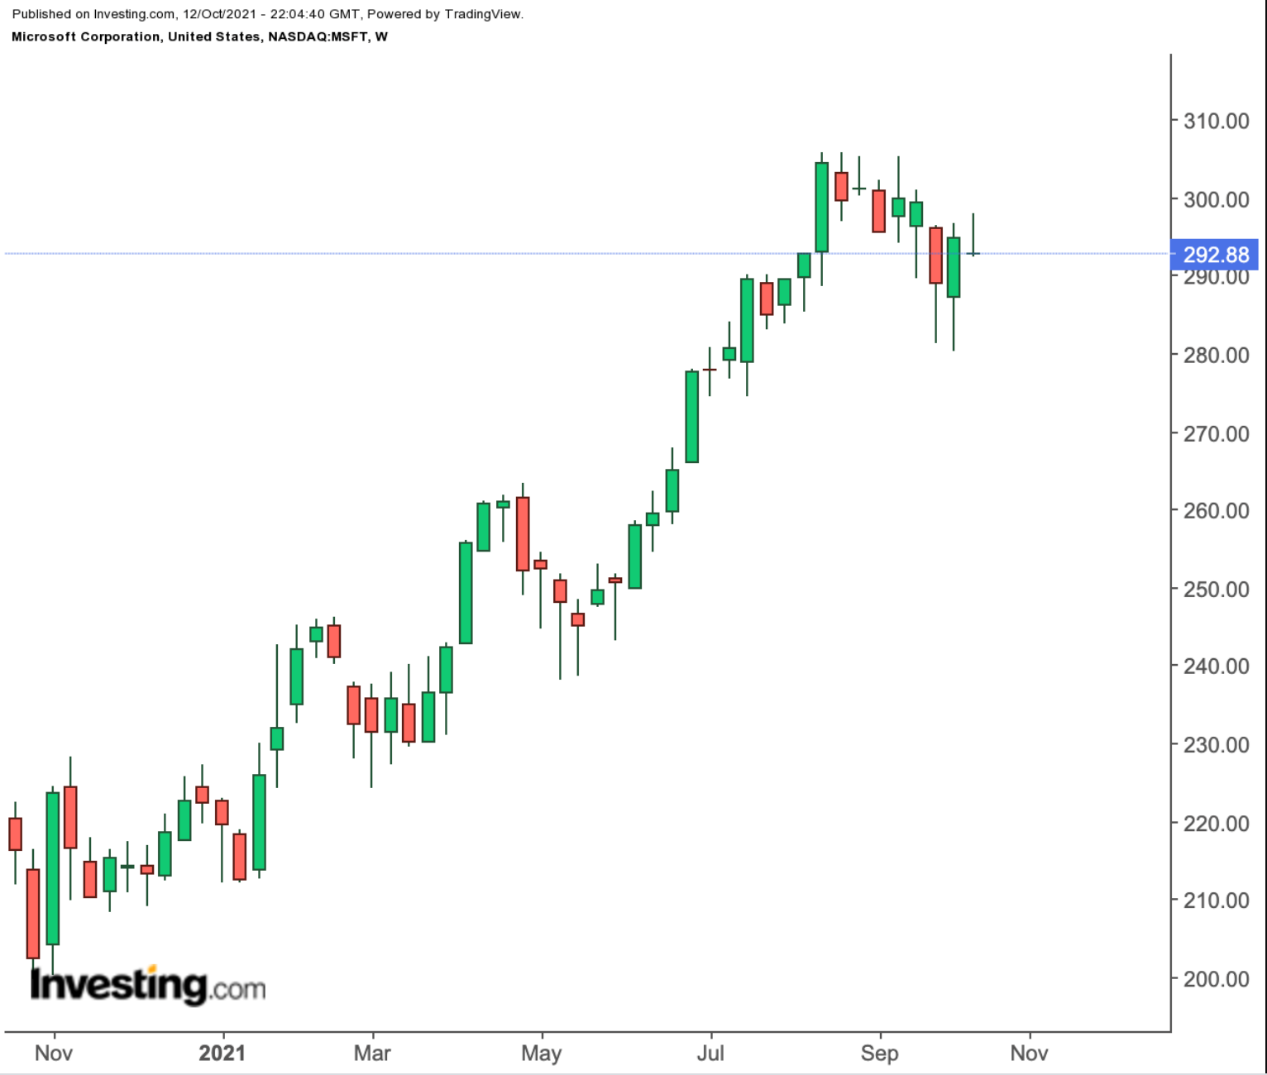 微软周线图,来源:Investing.com